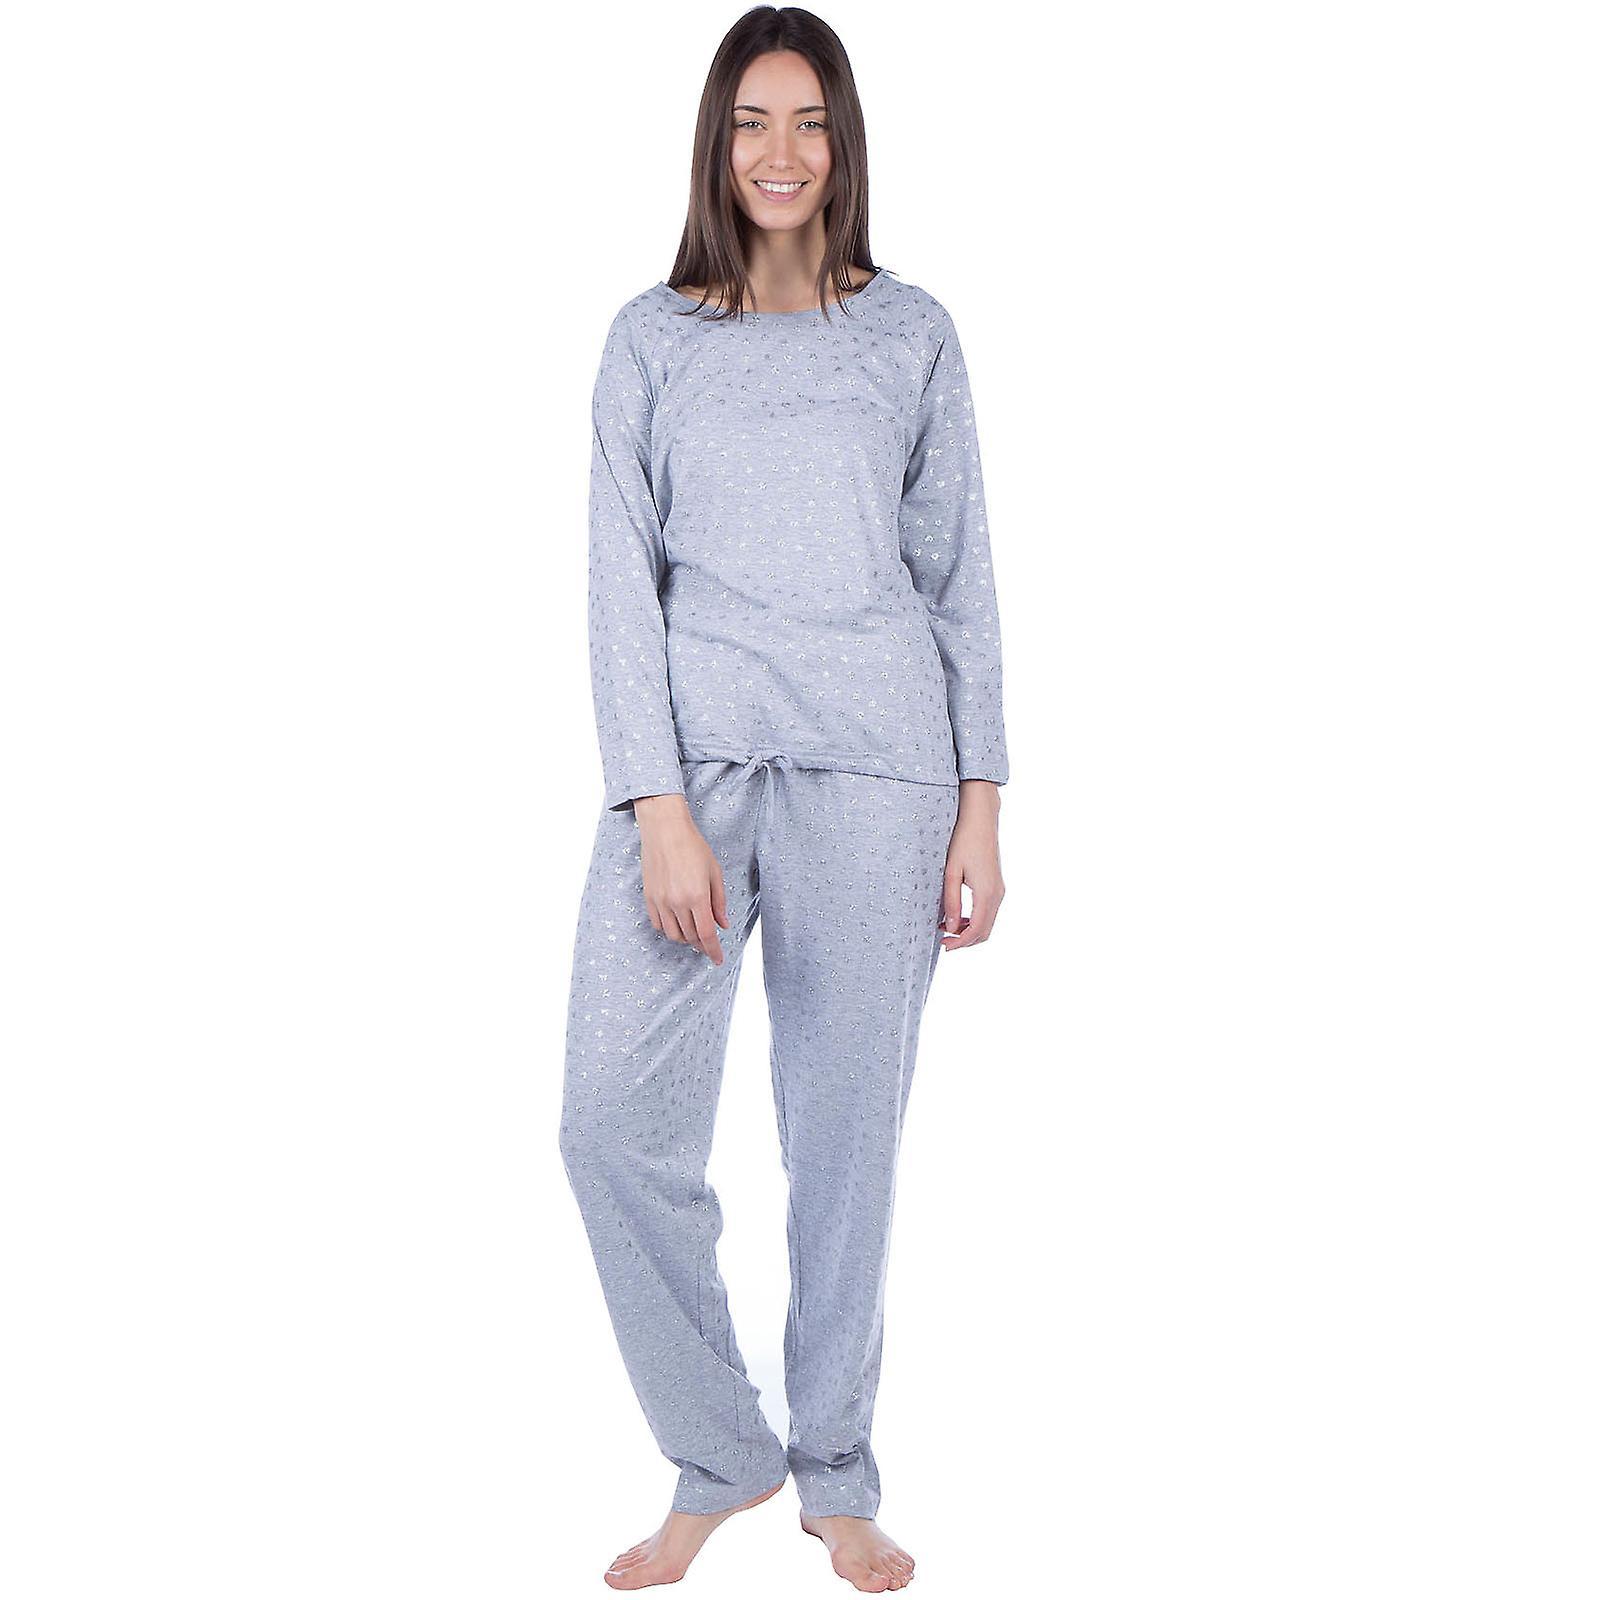 Masq Womens Long Sleeve Cotton Loungewear Sleepwear Top and Bottom Pyjama Set